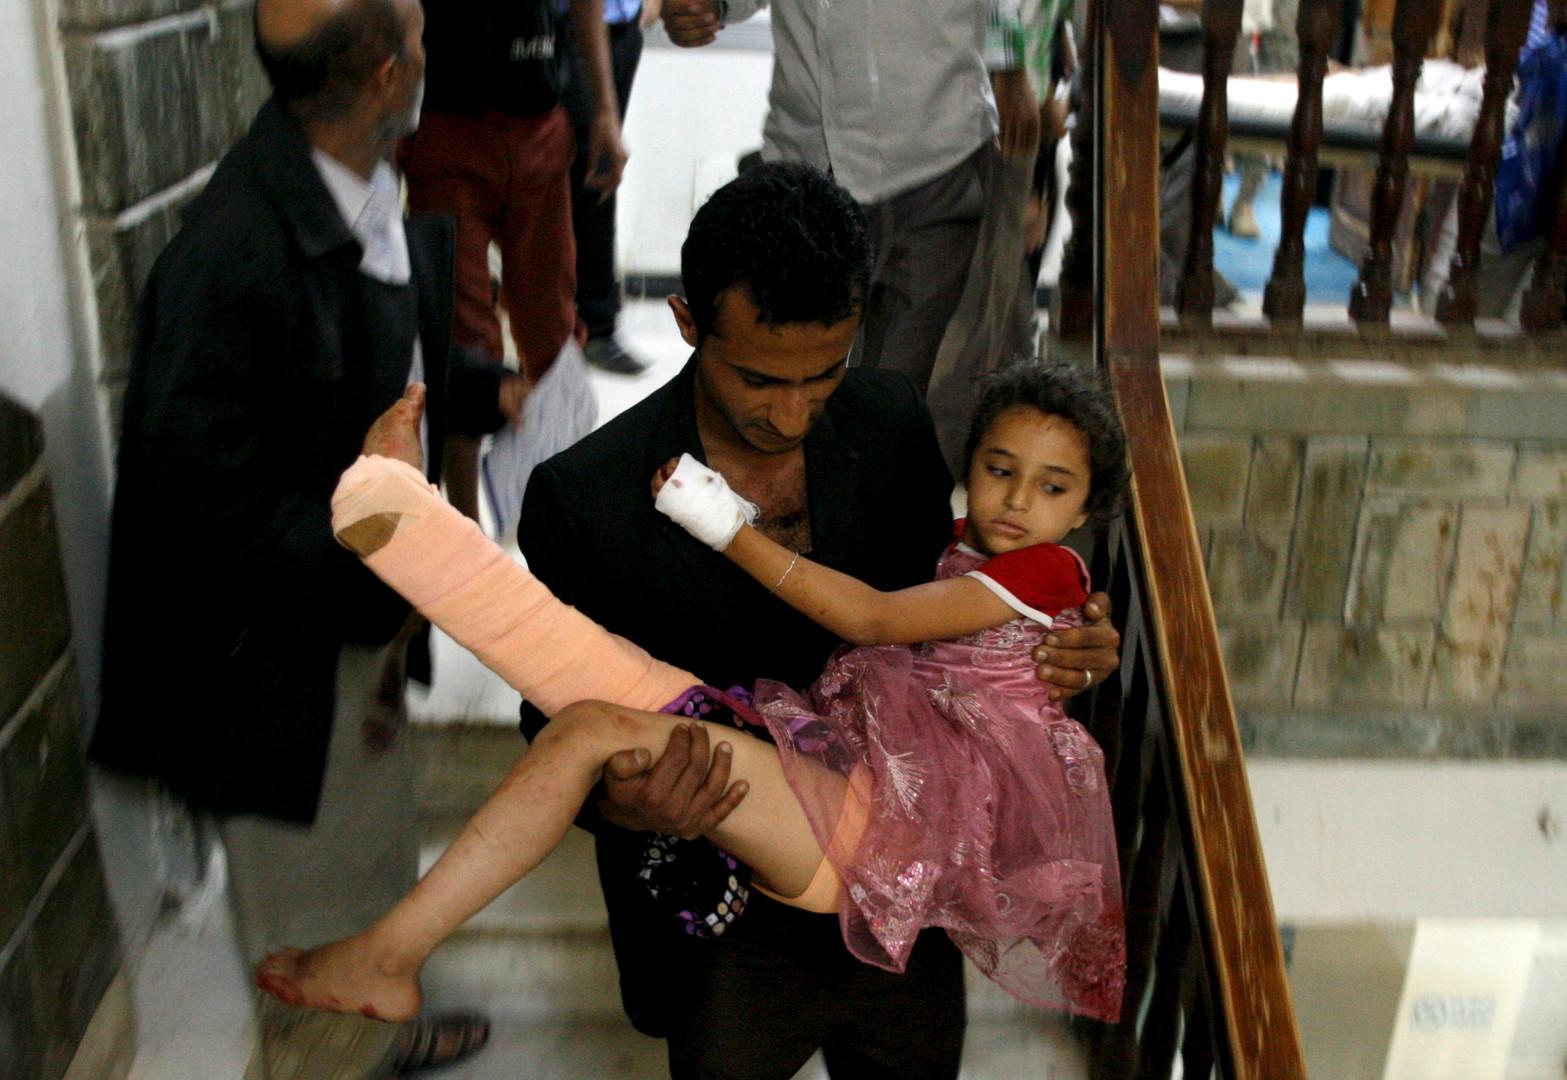 #Aleppo Boy: Omran Daqneesh als Symbol des Krieges in Syrien?